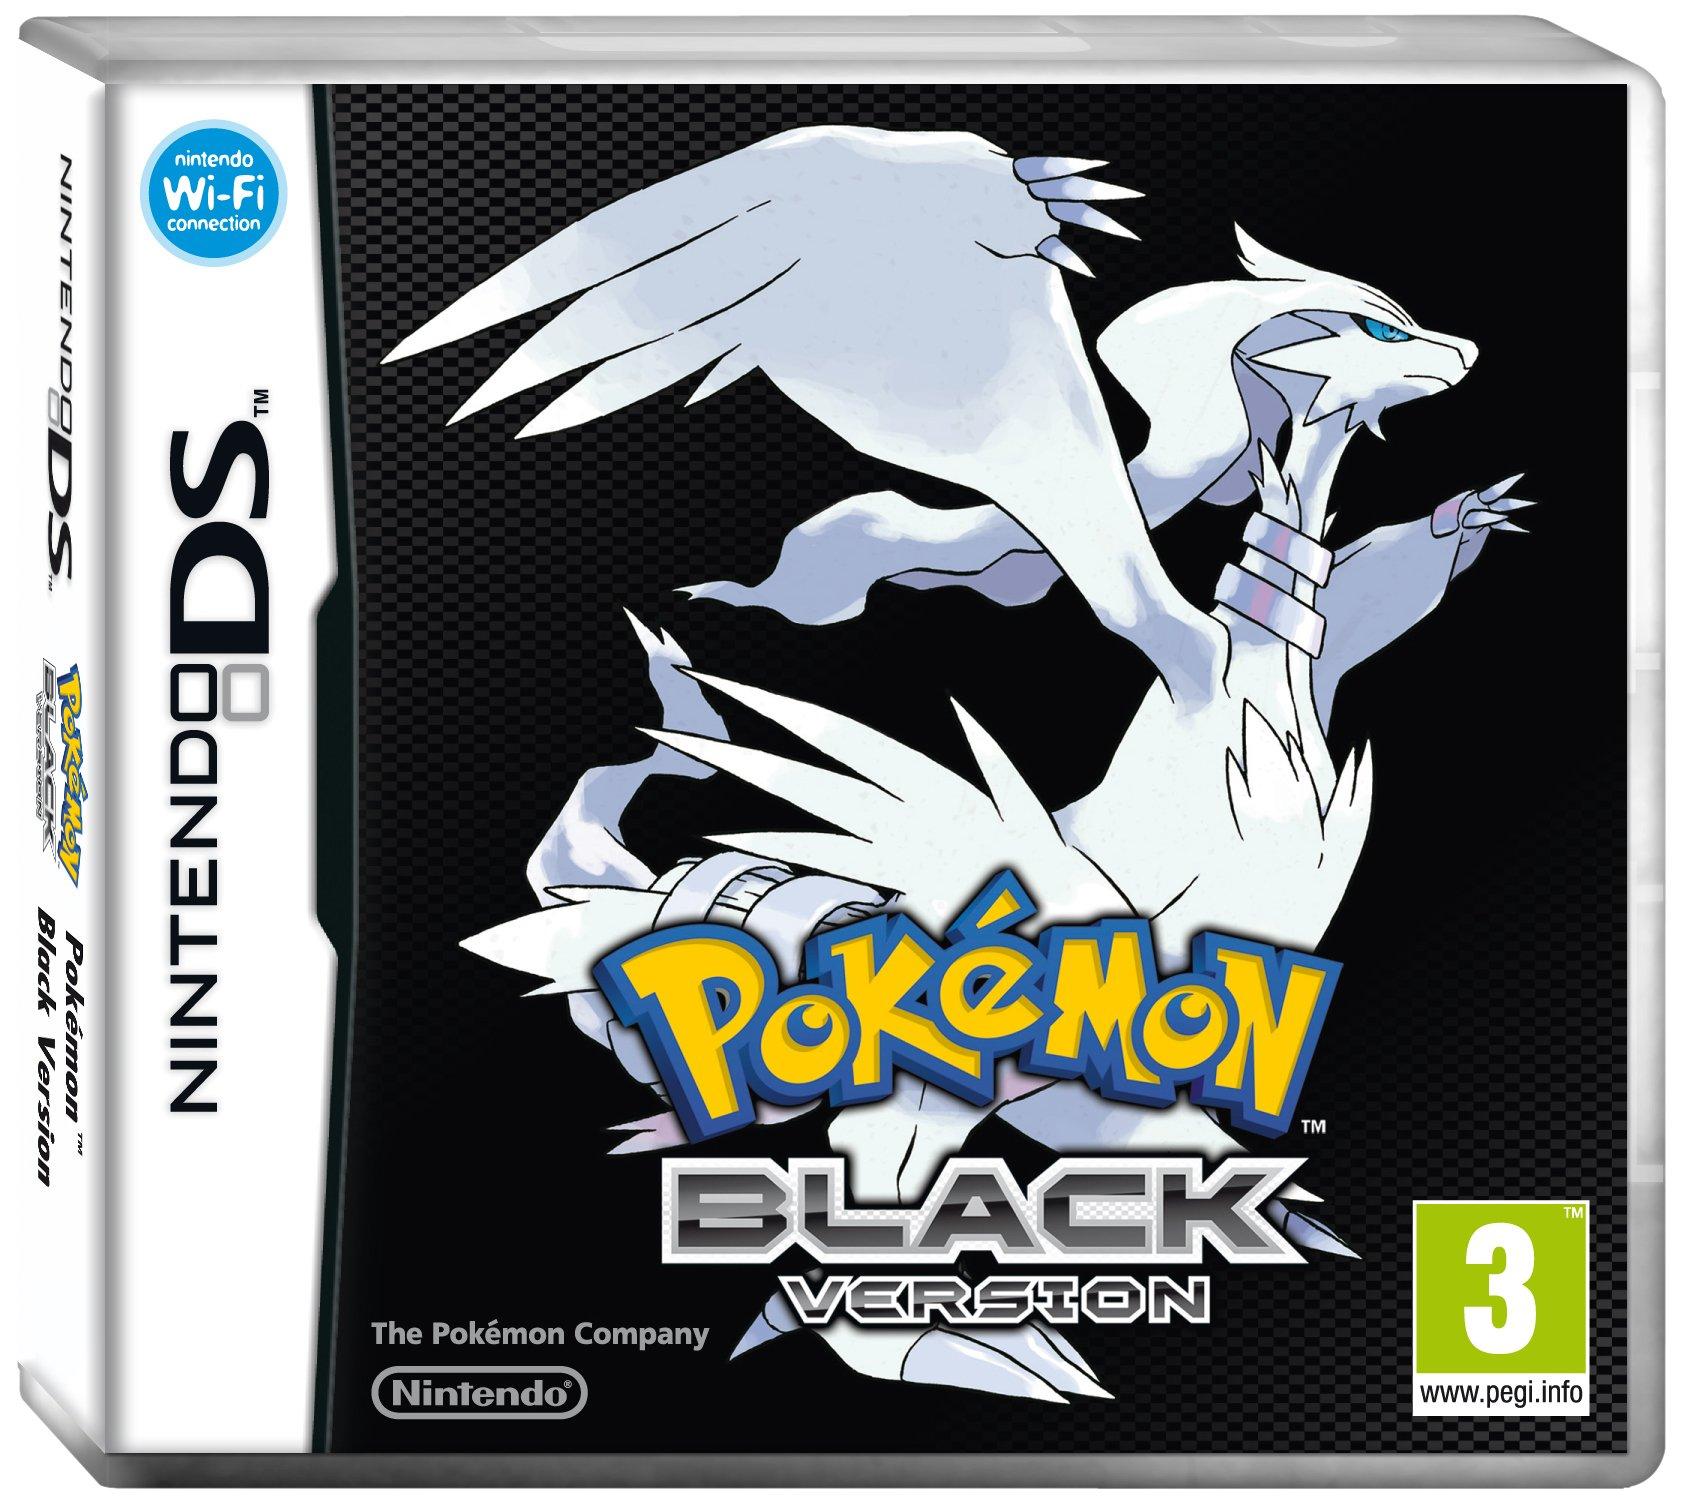 Pokemon release dates